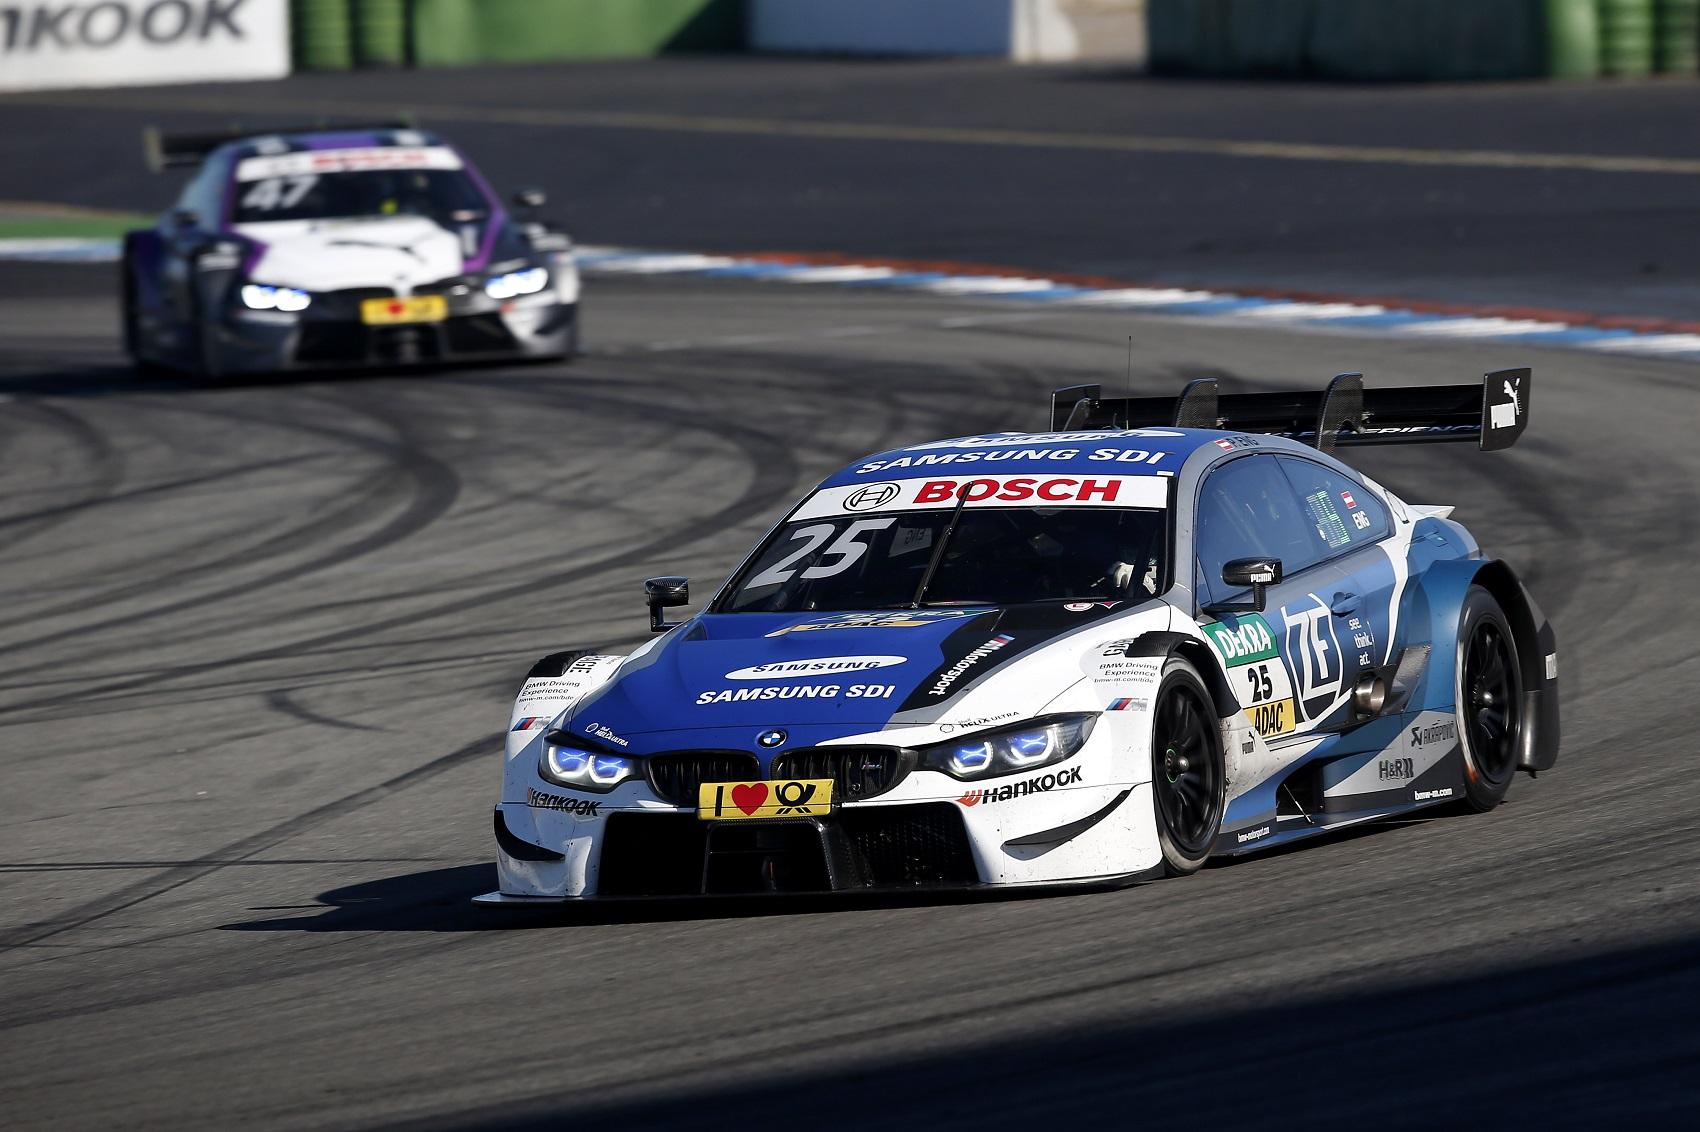 BMW DTM, racingline, racinglinehu, racingline.hu